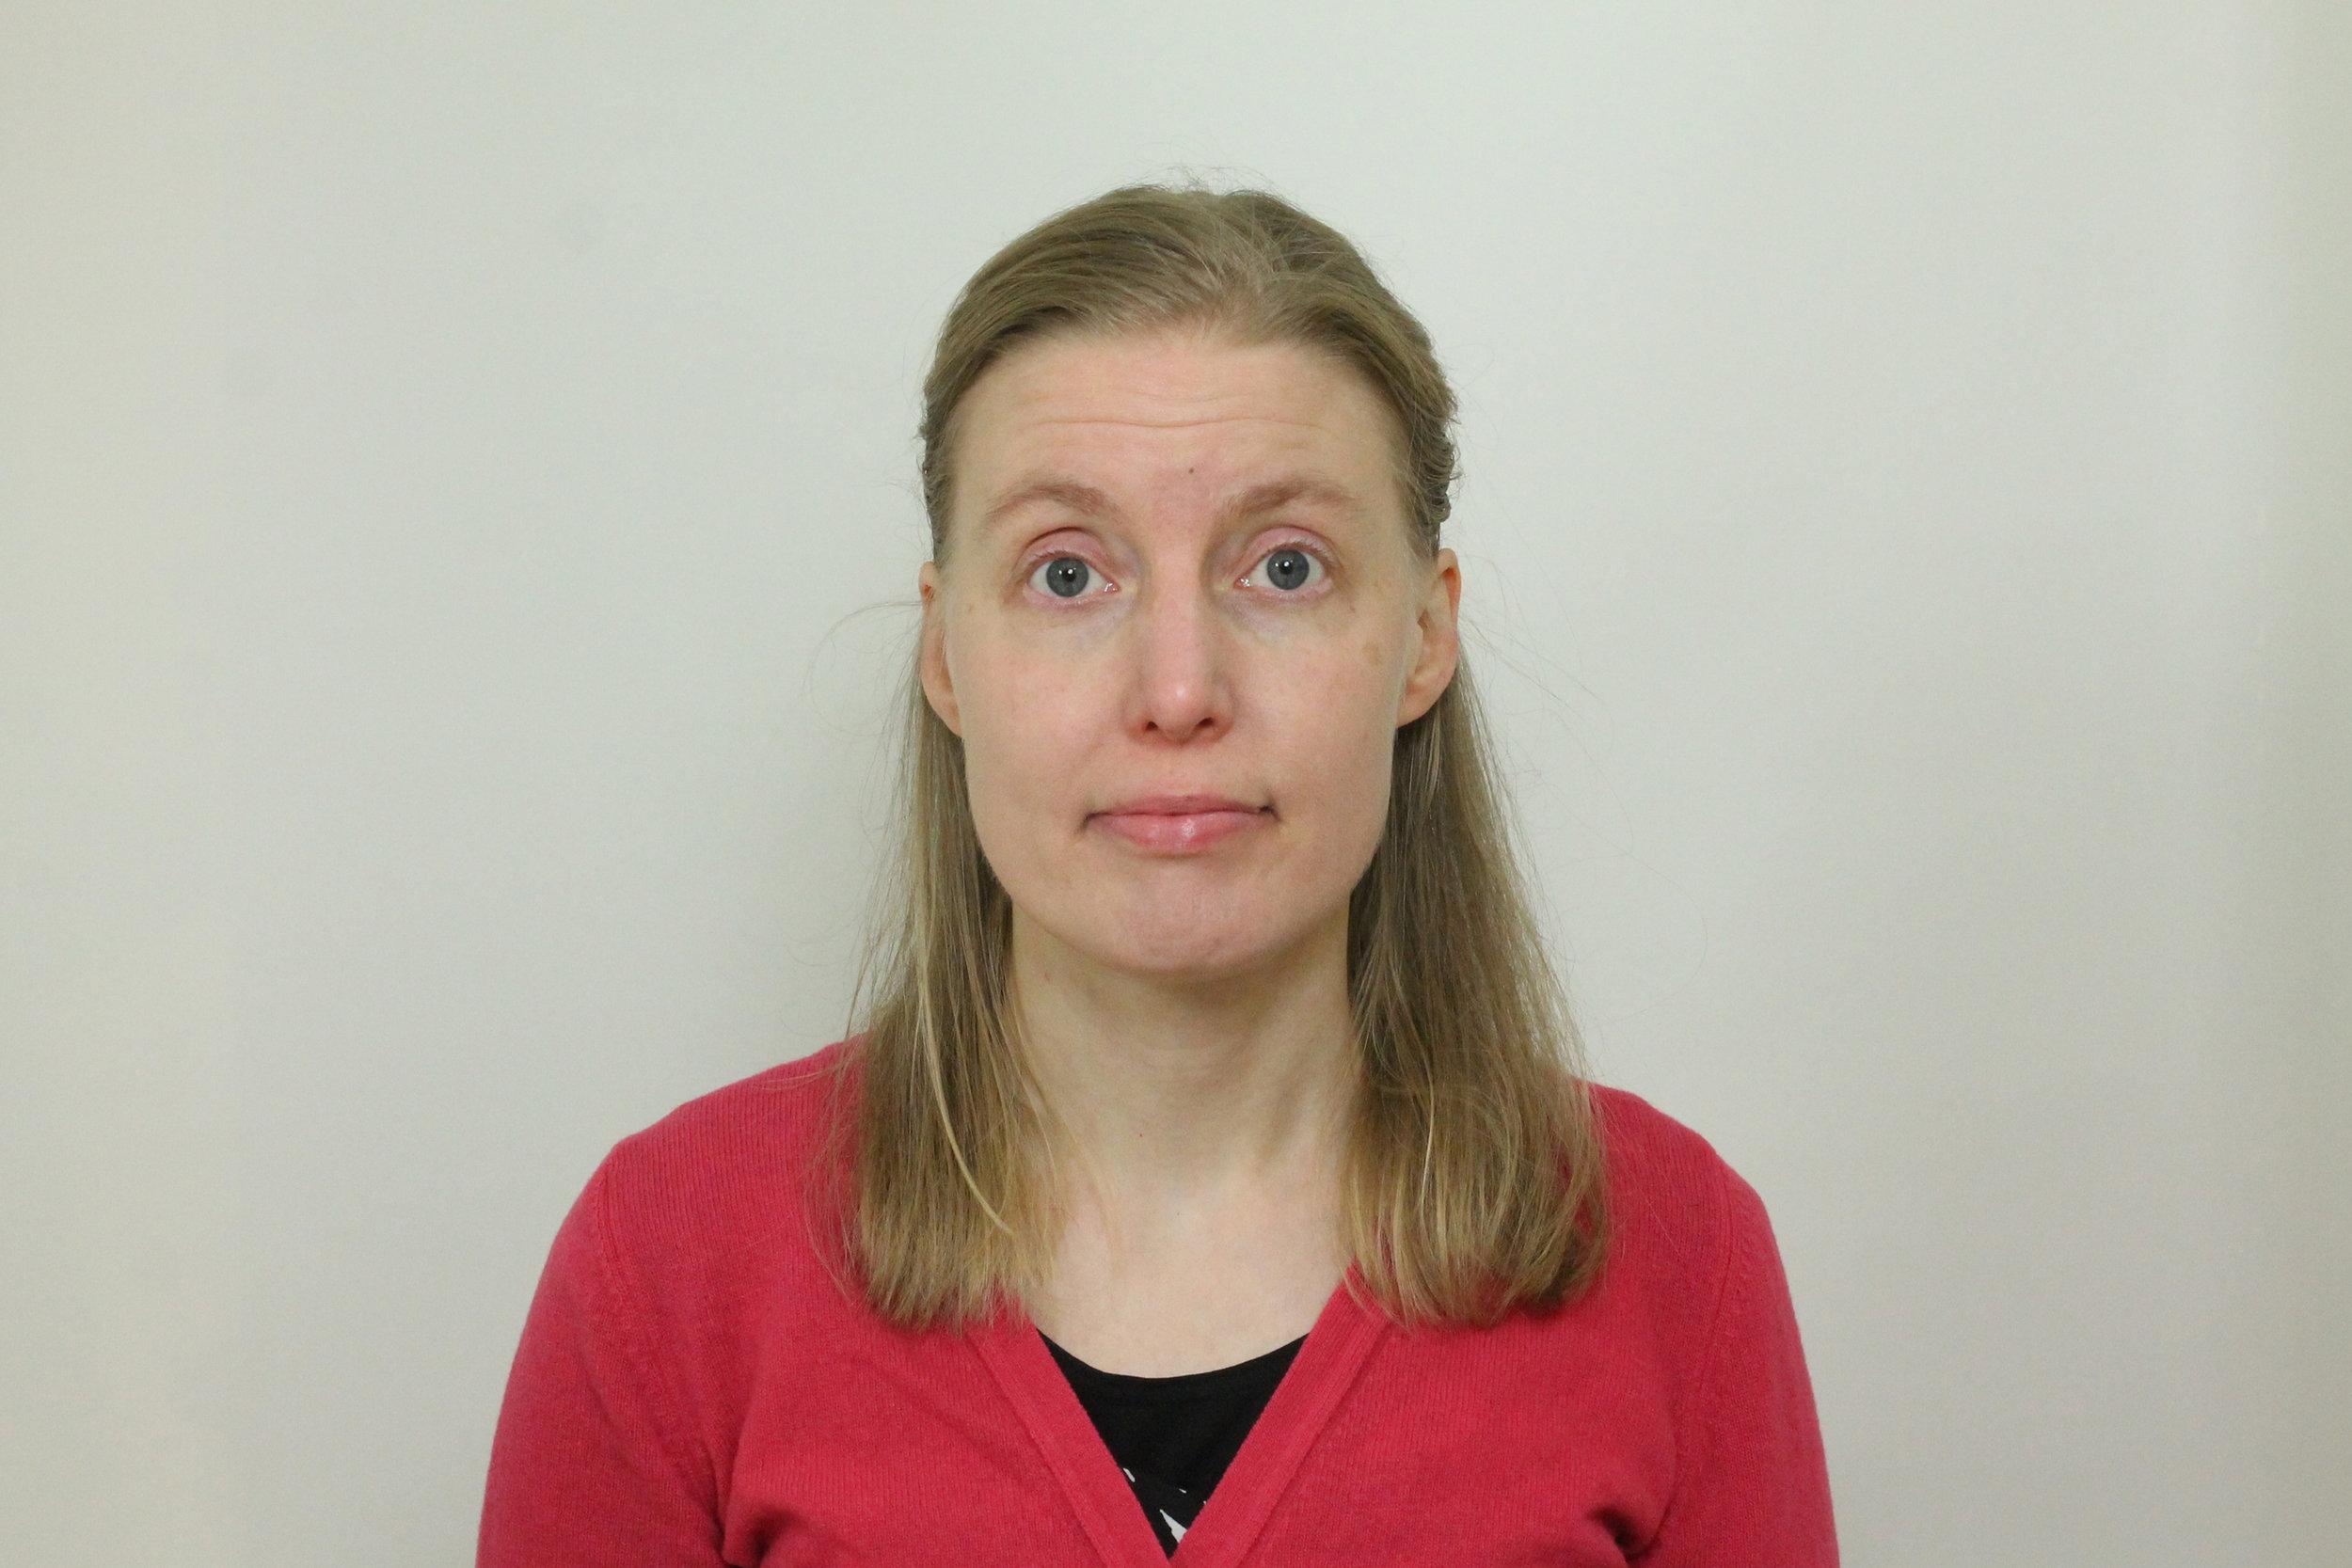 Anuleena Kimanen, Universitetet i Helsinki